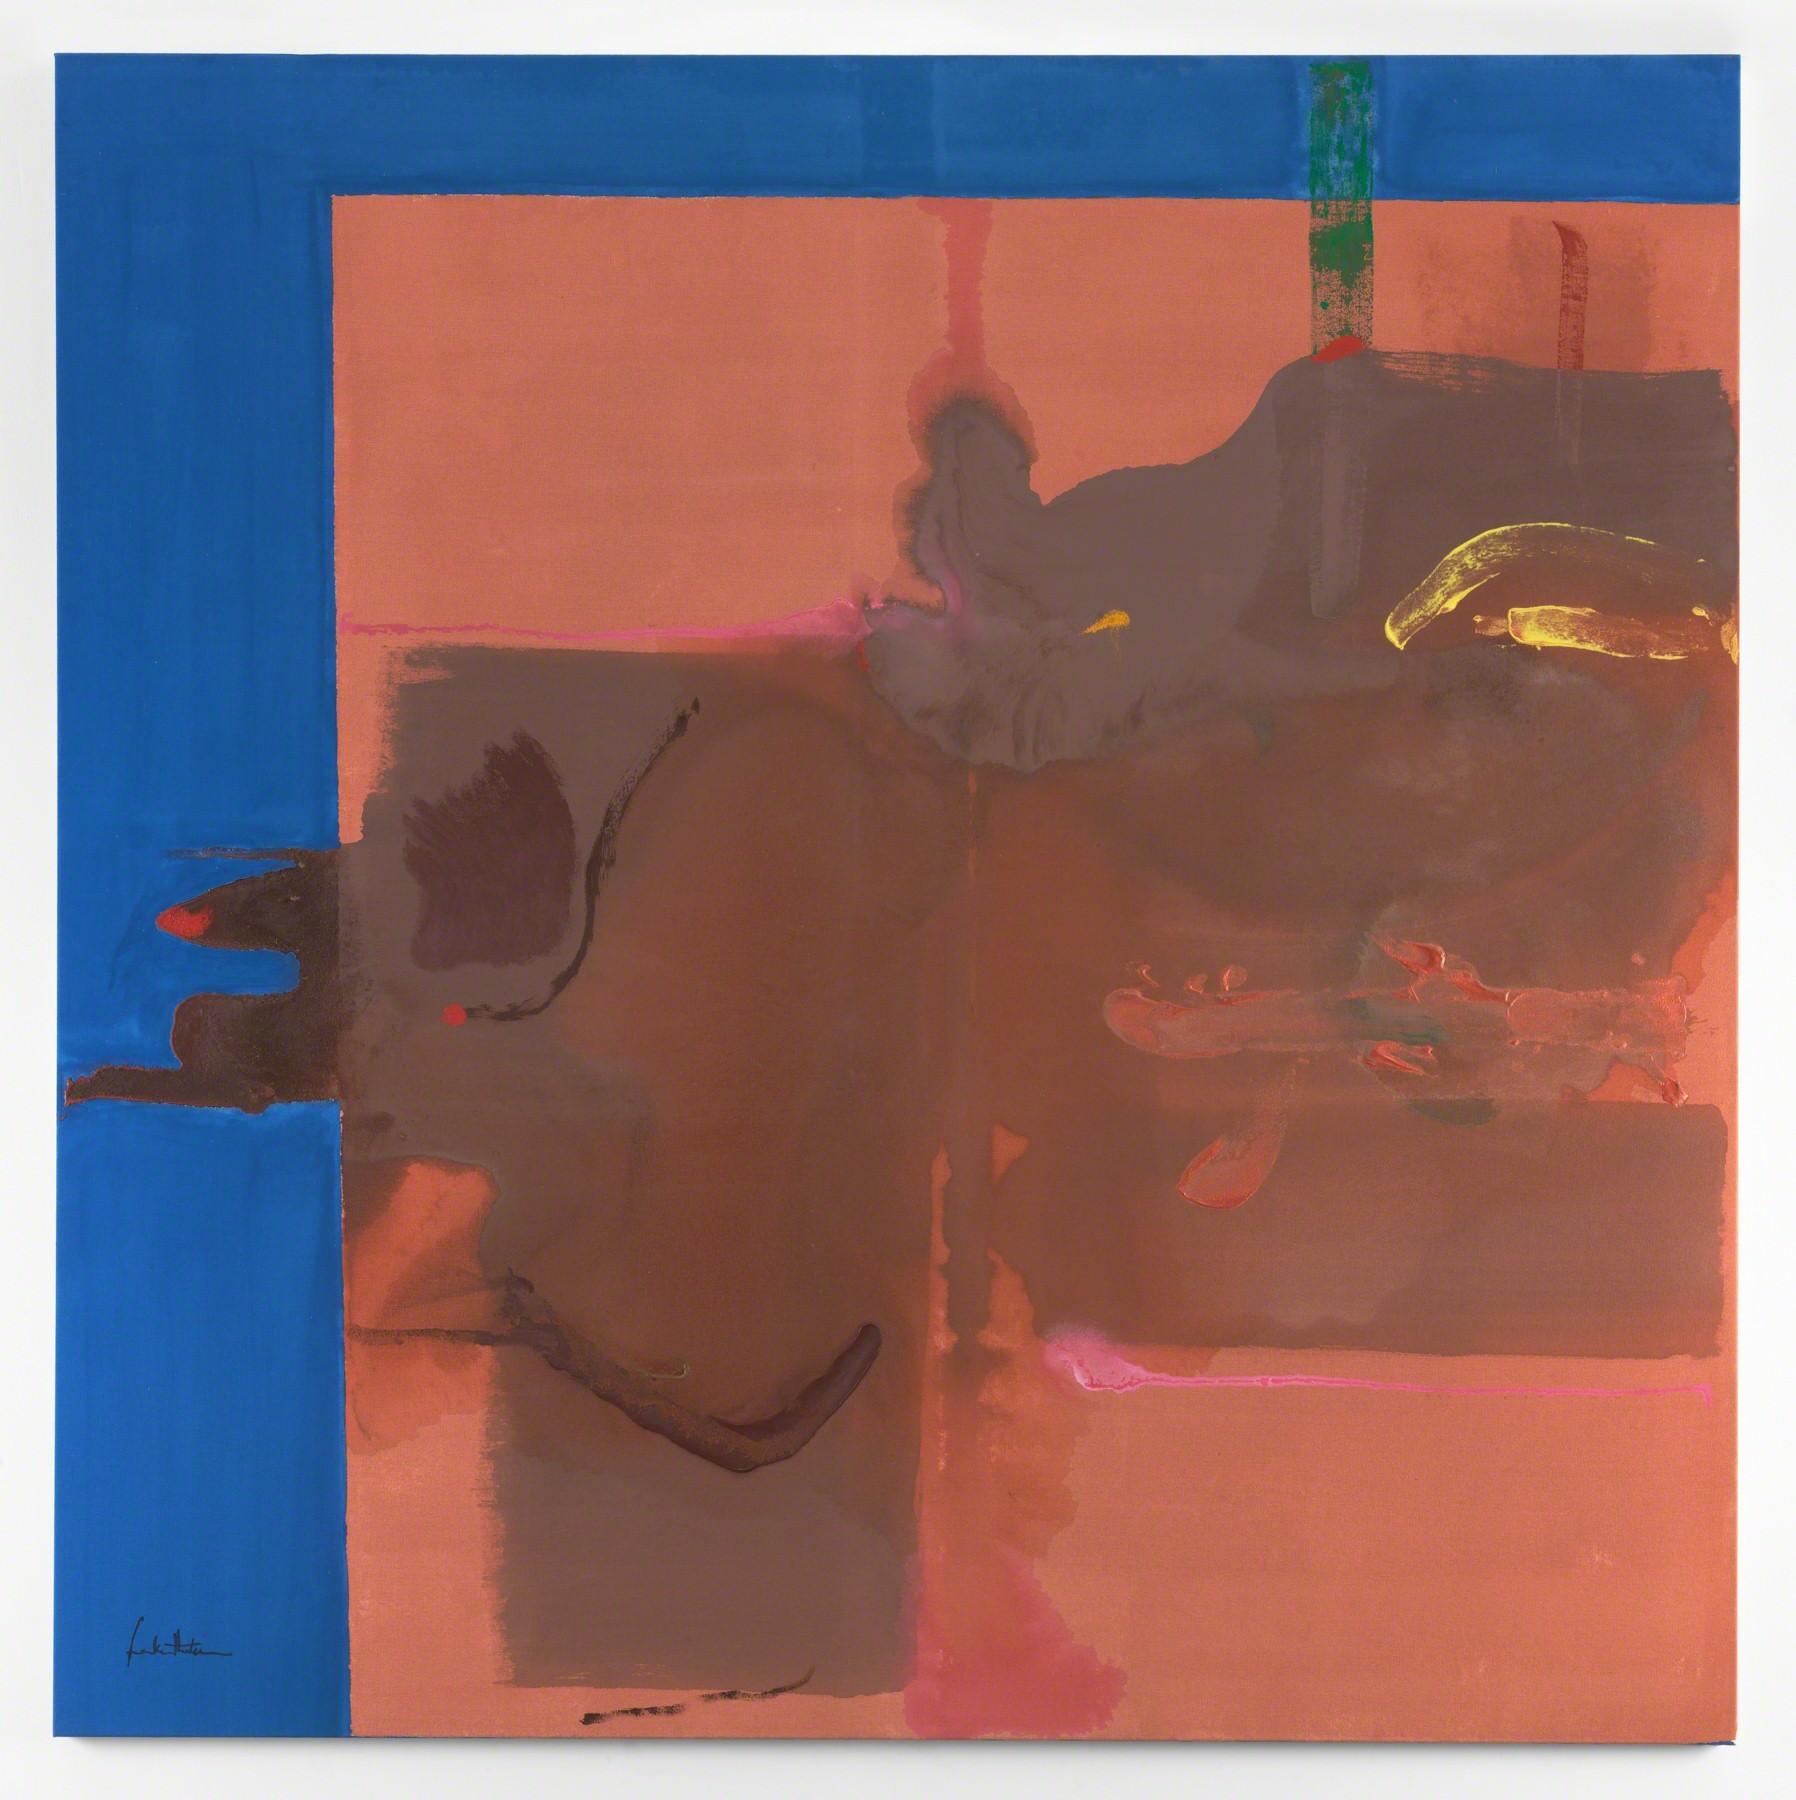 , 'Rio Grande,' 1987, Ameringer | McEnery | Yohe